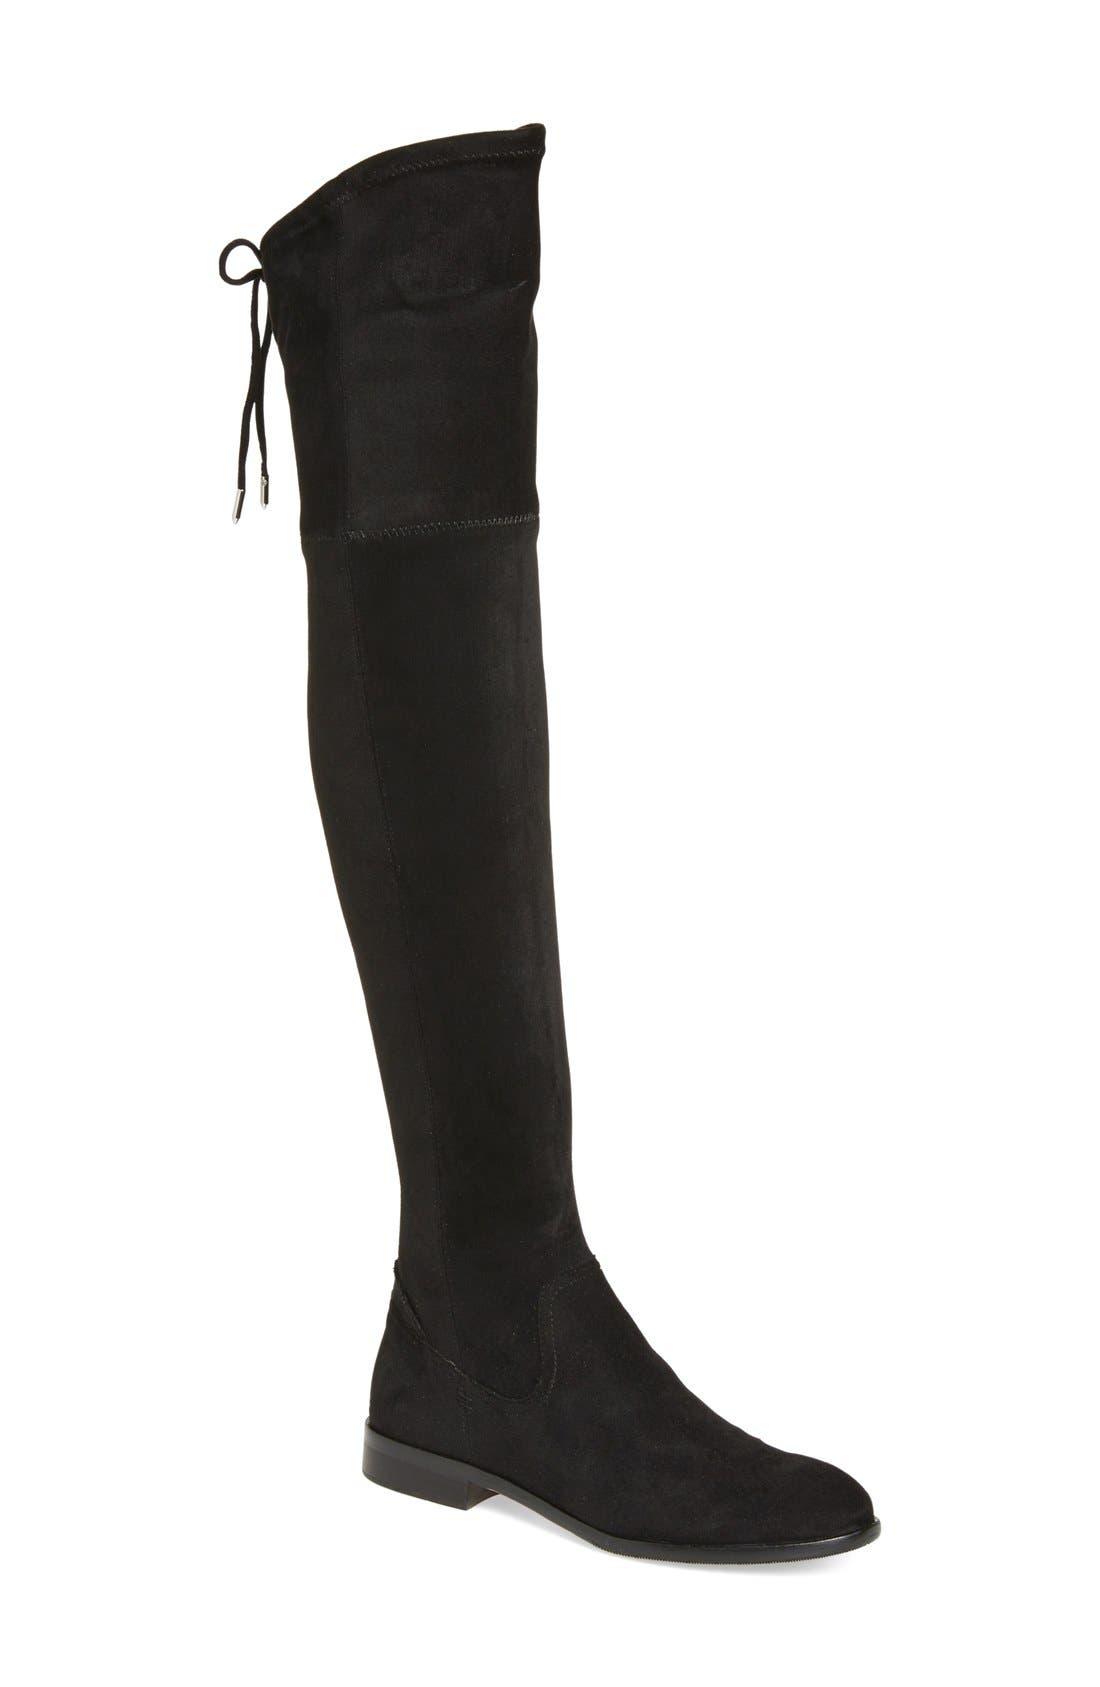 Main Image - Dolce Vita 'Neely' Over the Knee Boot (Women)